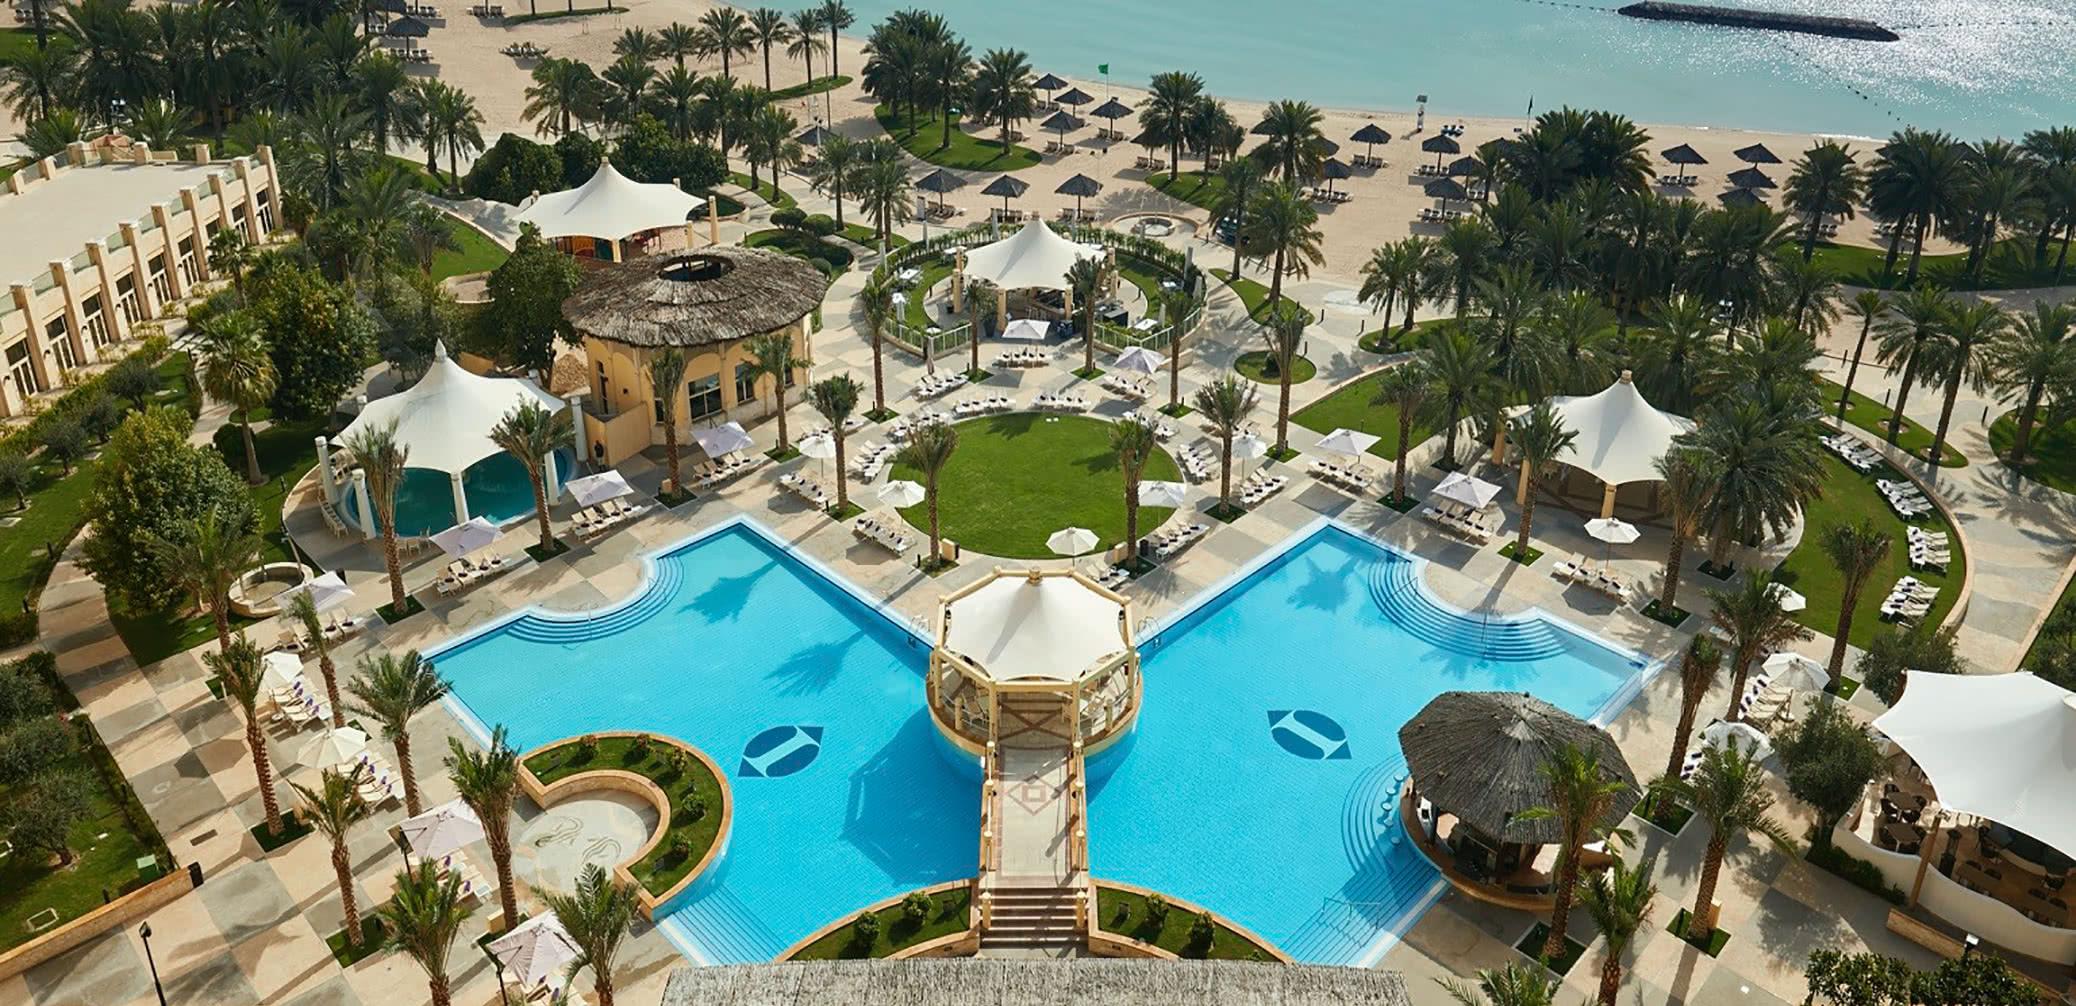 Top 10 Best Luxury Hotels in Doha, Qatar